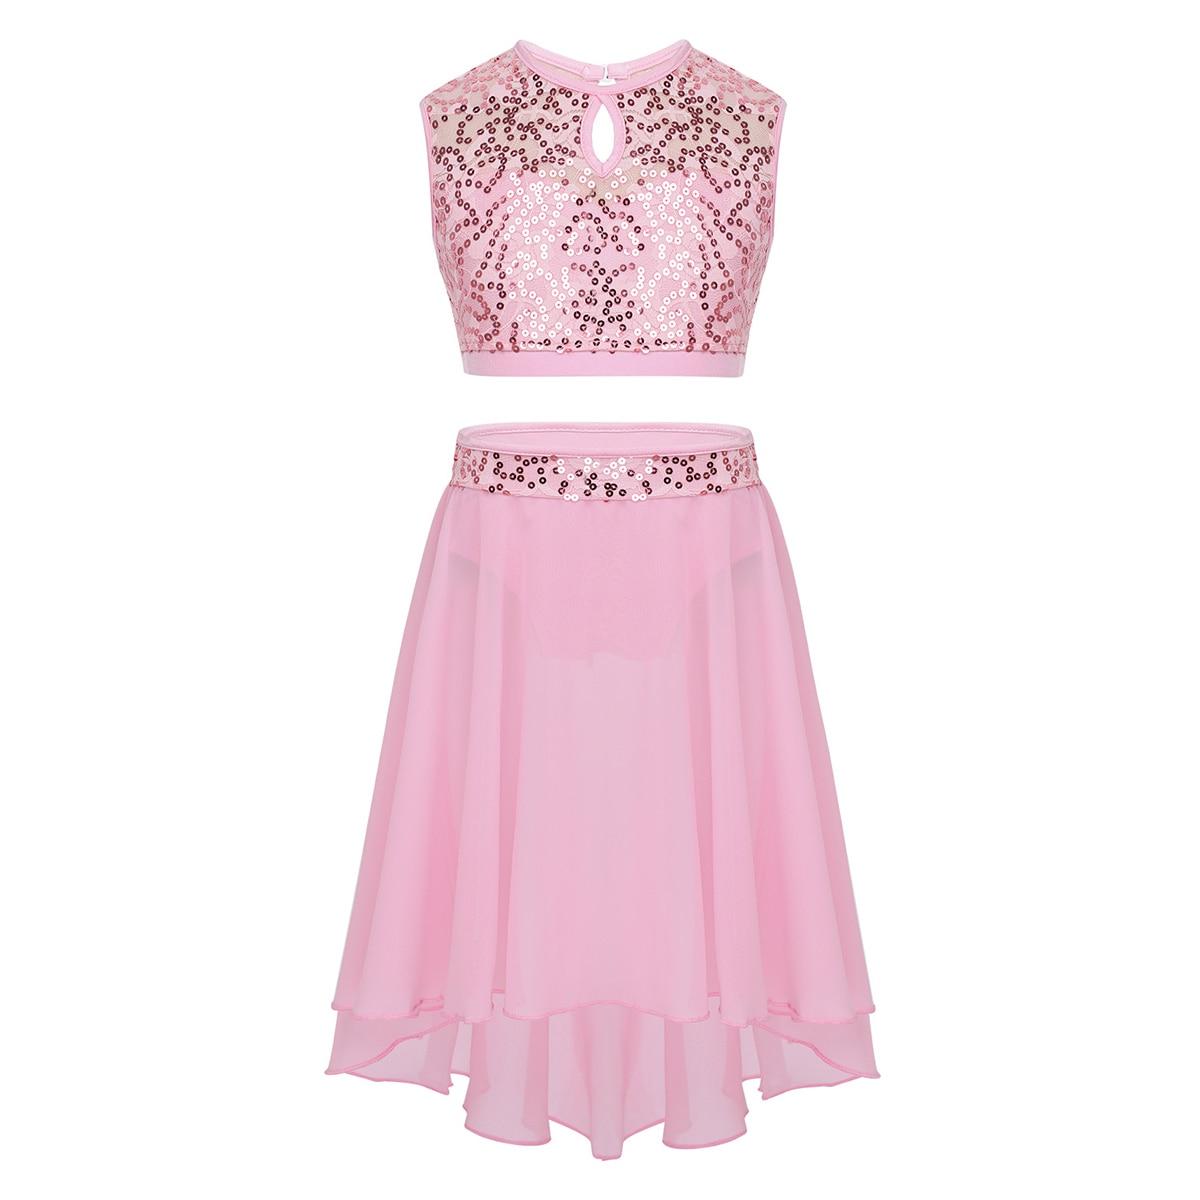 Image 2 - Girls Lyrical Dance Costumes Ballet Dress Sleeveless Sequined Crop Top with Dipped Hem Chiffon Skirt Set for Celebration DancingBallet   -